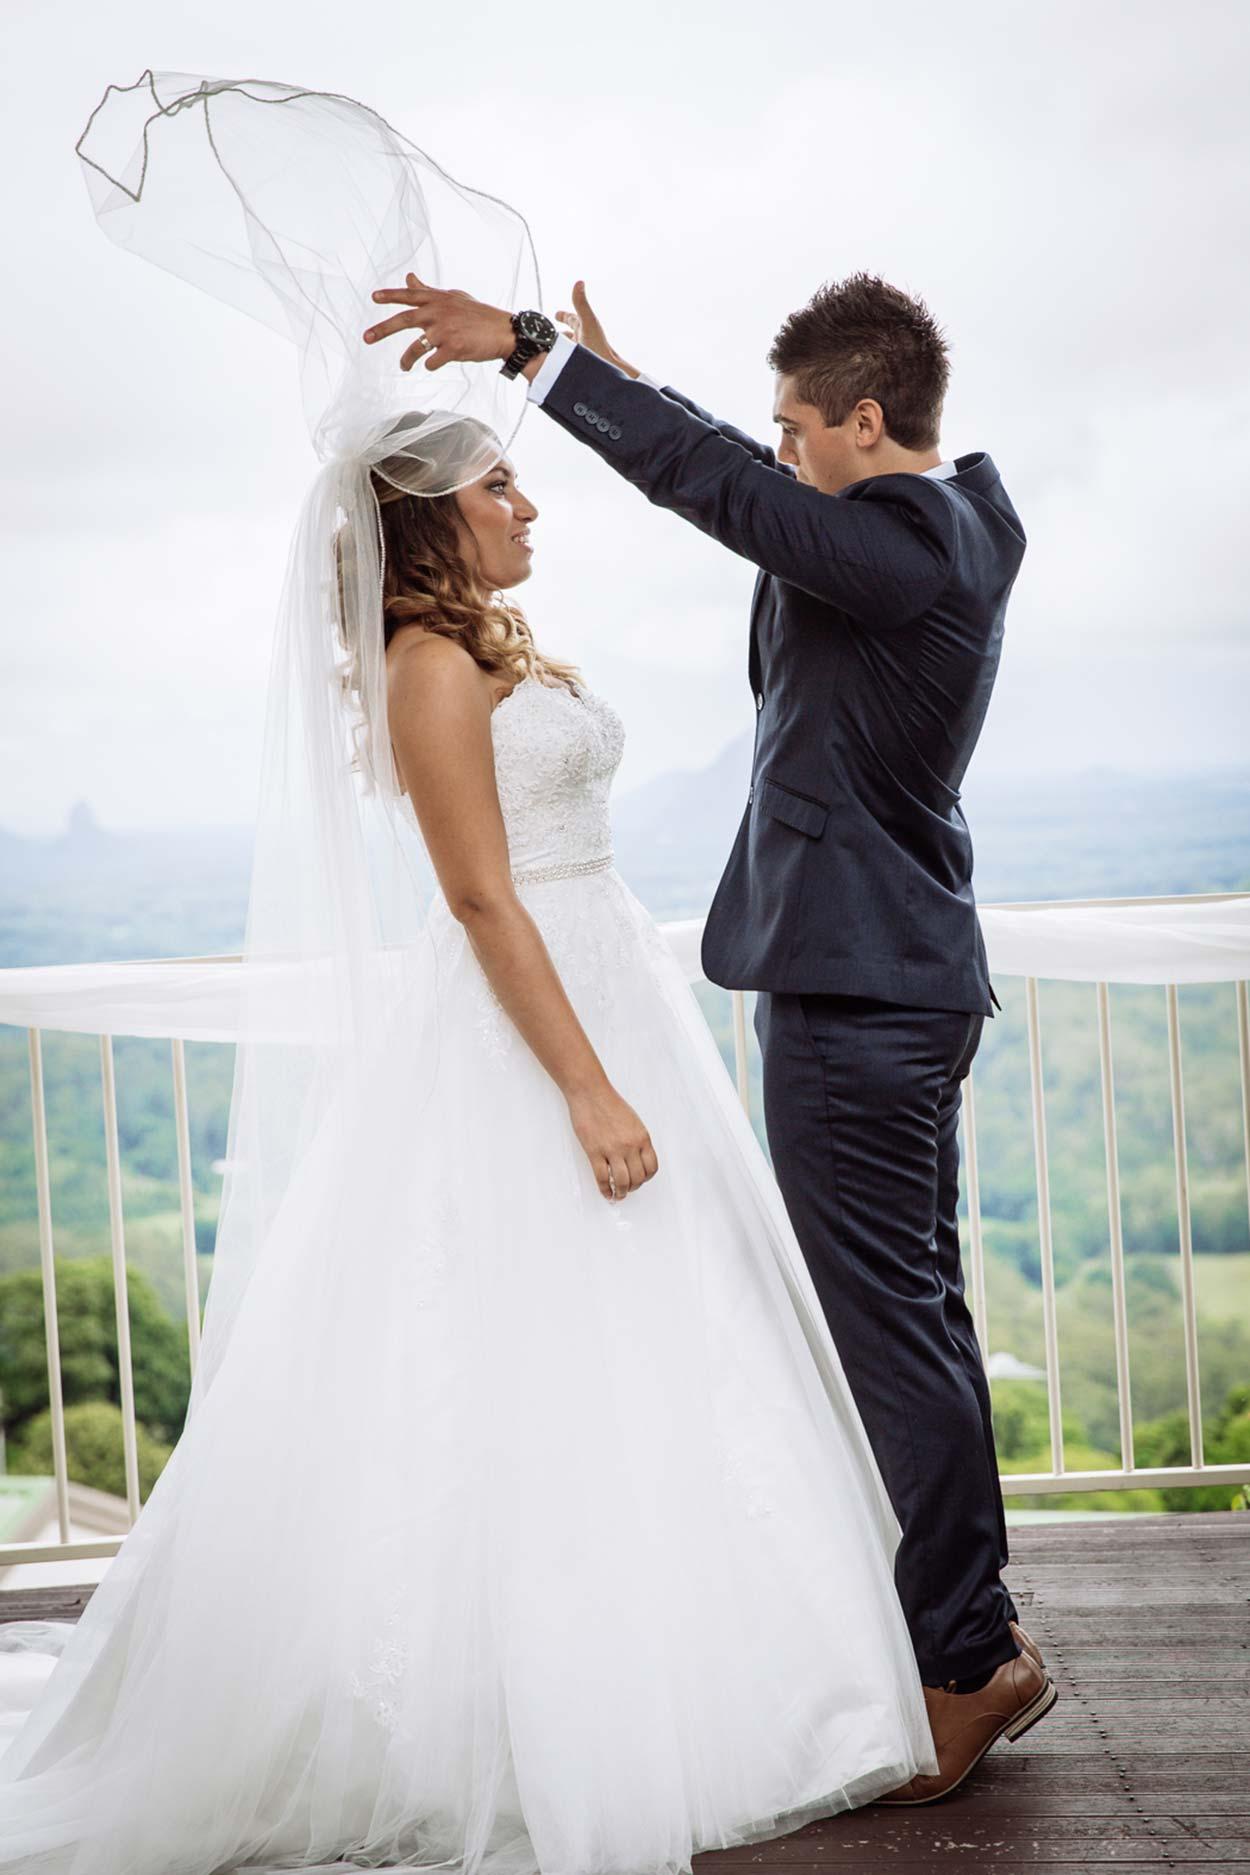 sunshine-coast-destination-wedding-photographers-brisbane-queensland-australian-maleny-noosa-beach-hinterland-montville-flaxton-gold-caloundra-elopement-photos-best-recommended-eco-friendly-packages-69.jpg